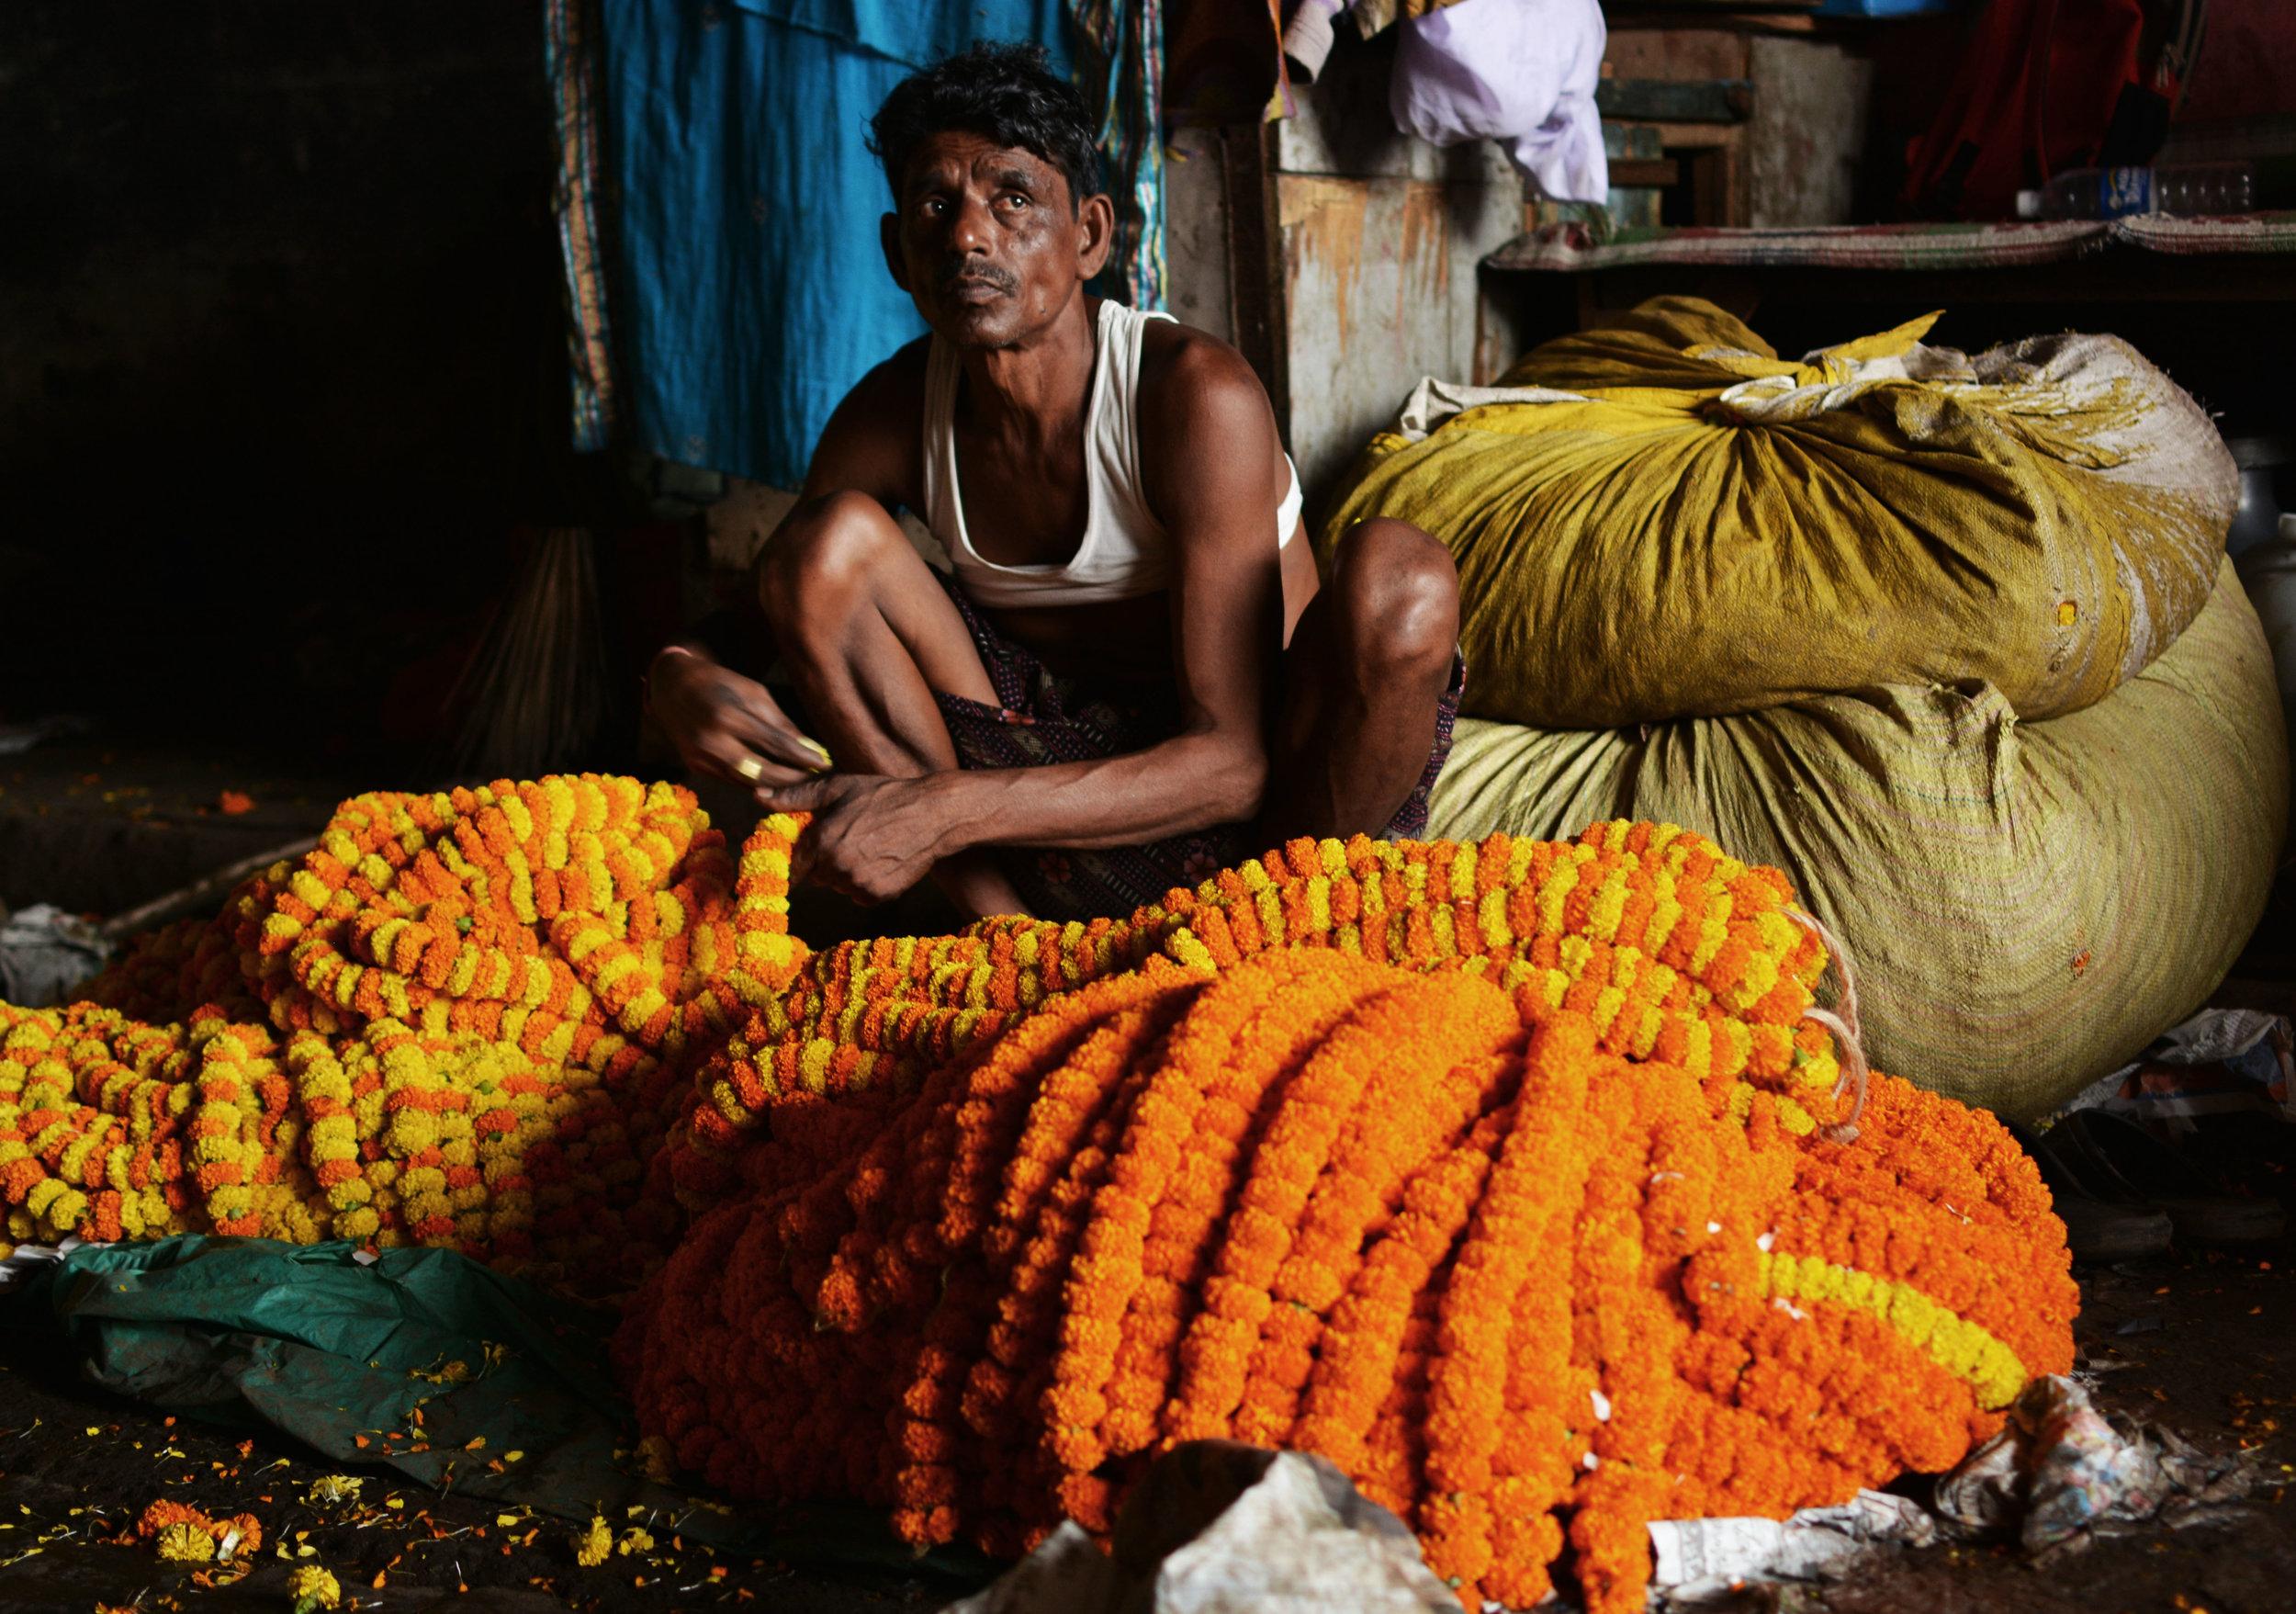 india - man at flowers.jpg